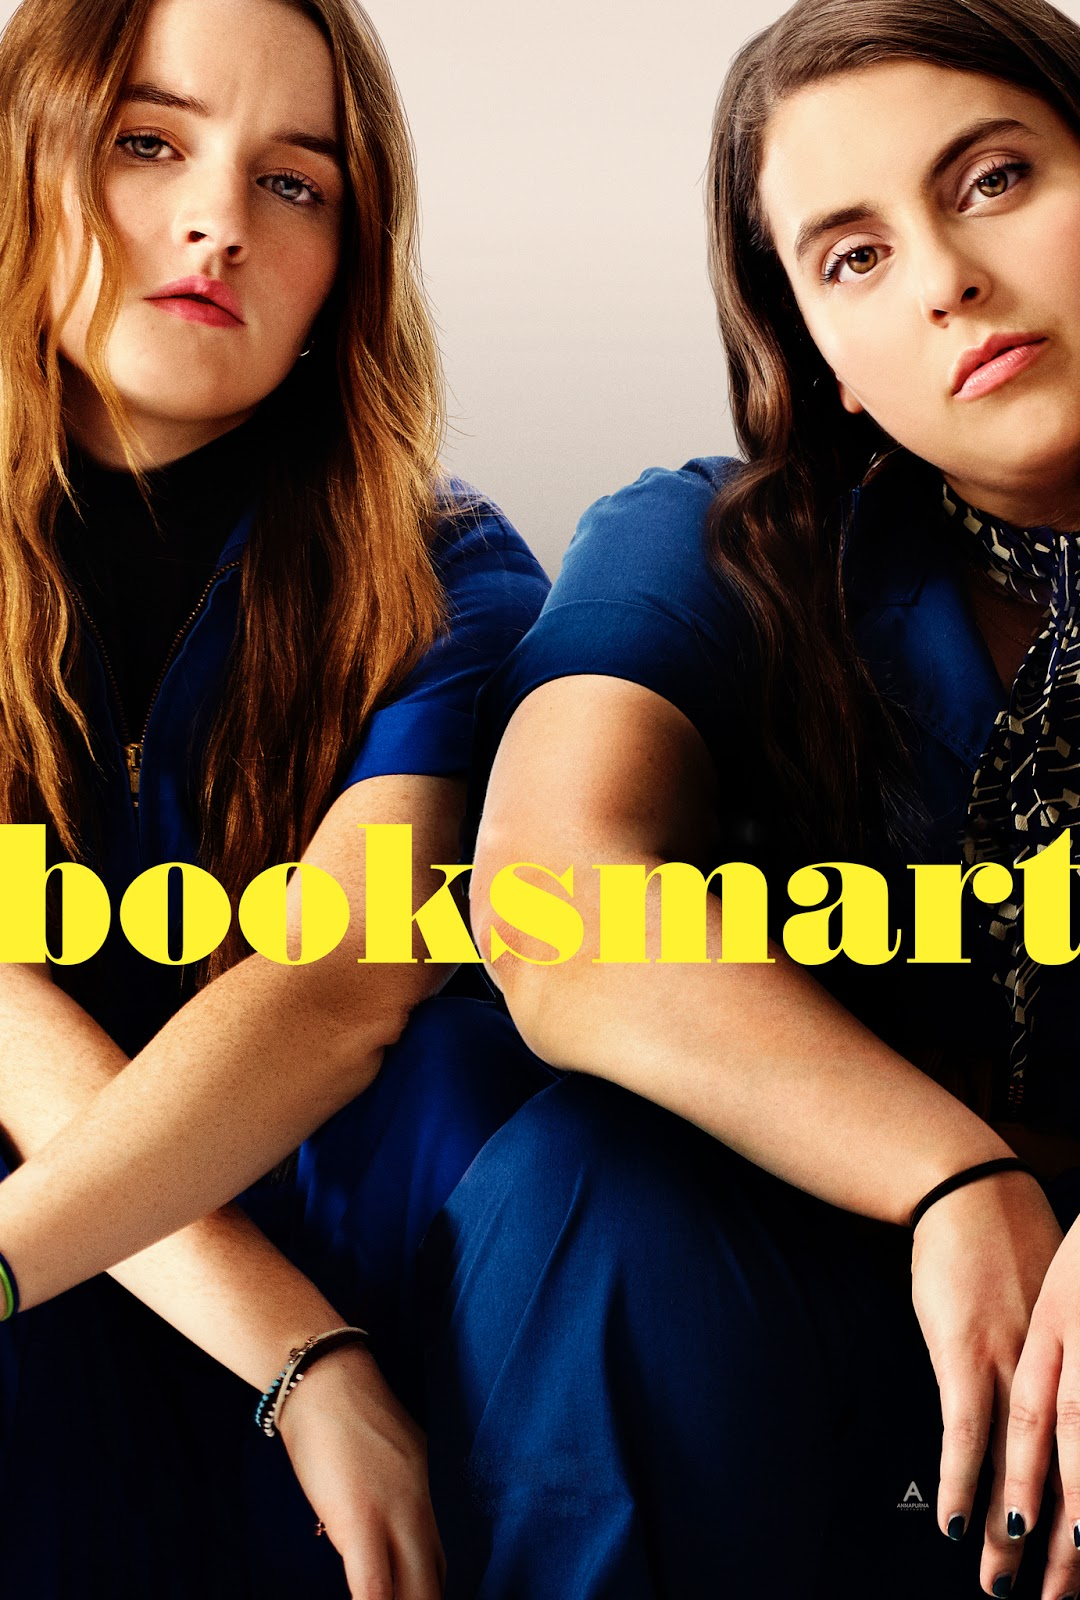 Booksmart [2019] [DVDR] [NTSC] [Latino] [Menú Editado]